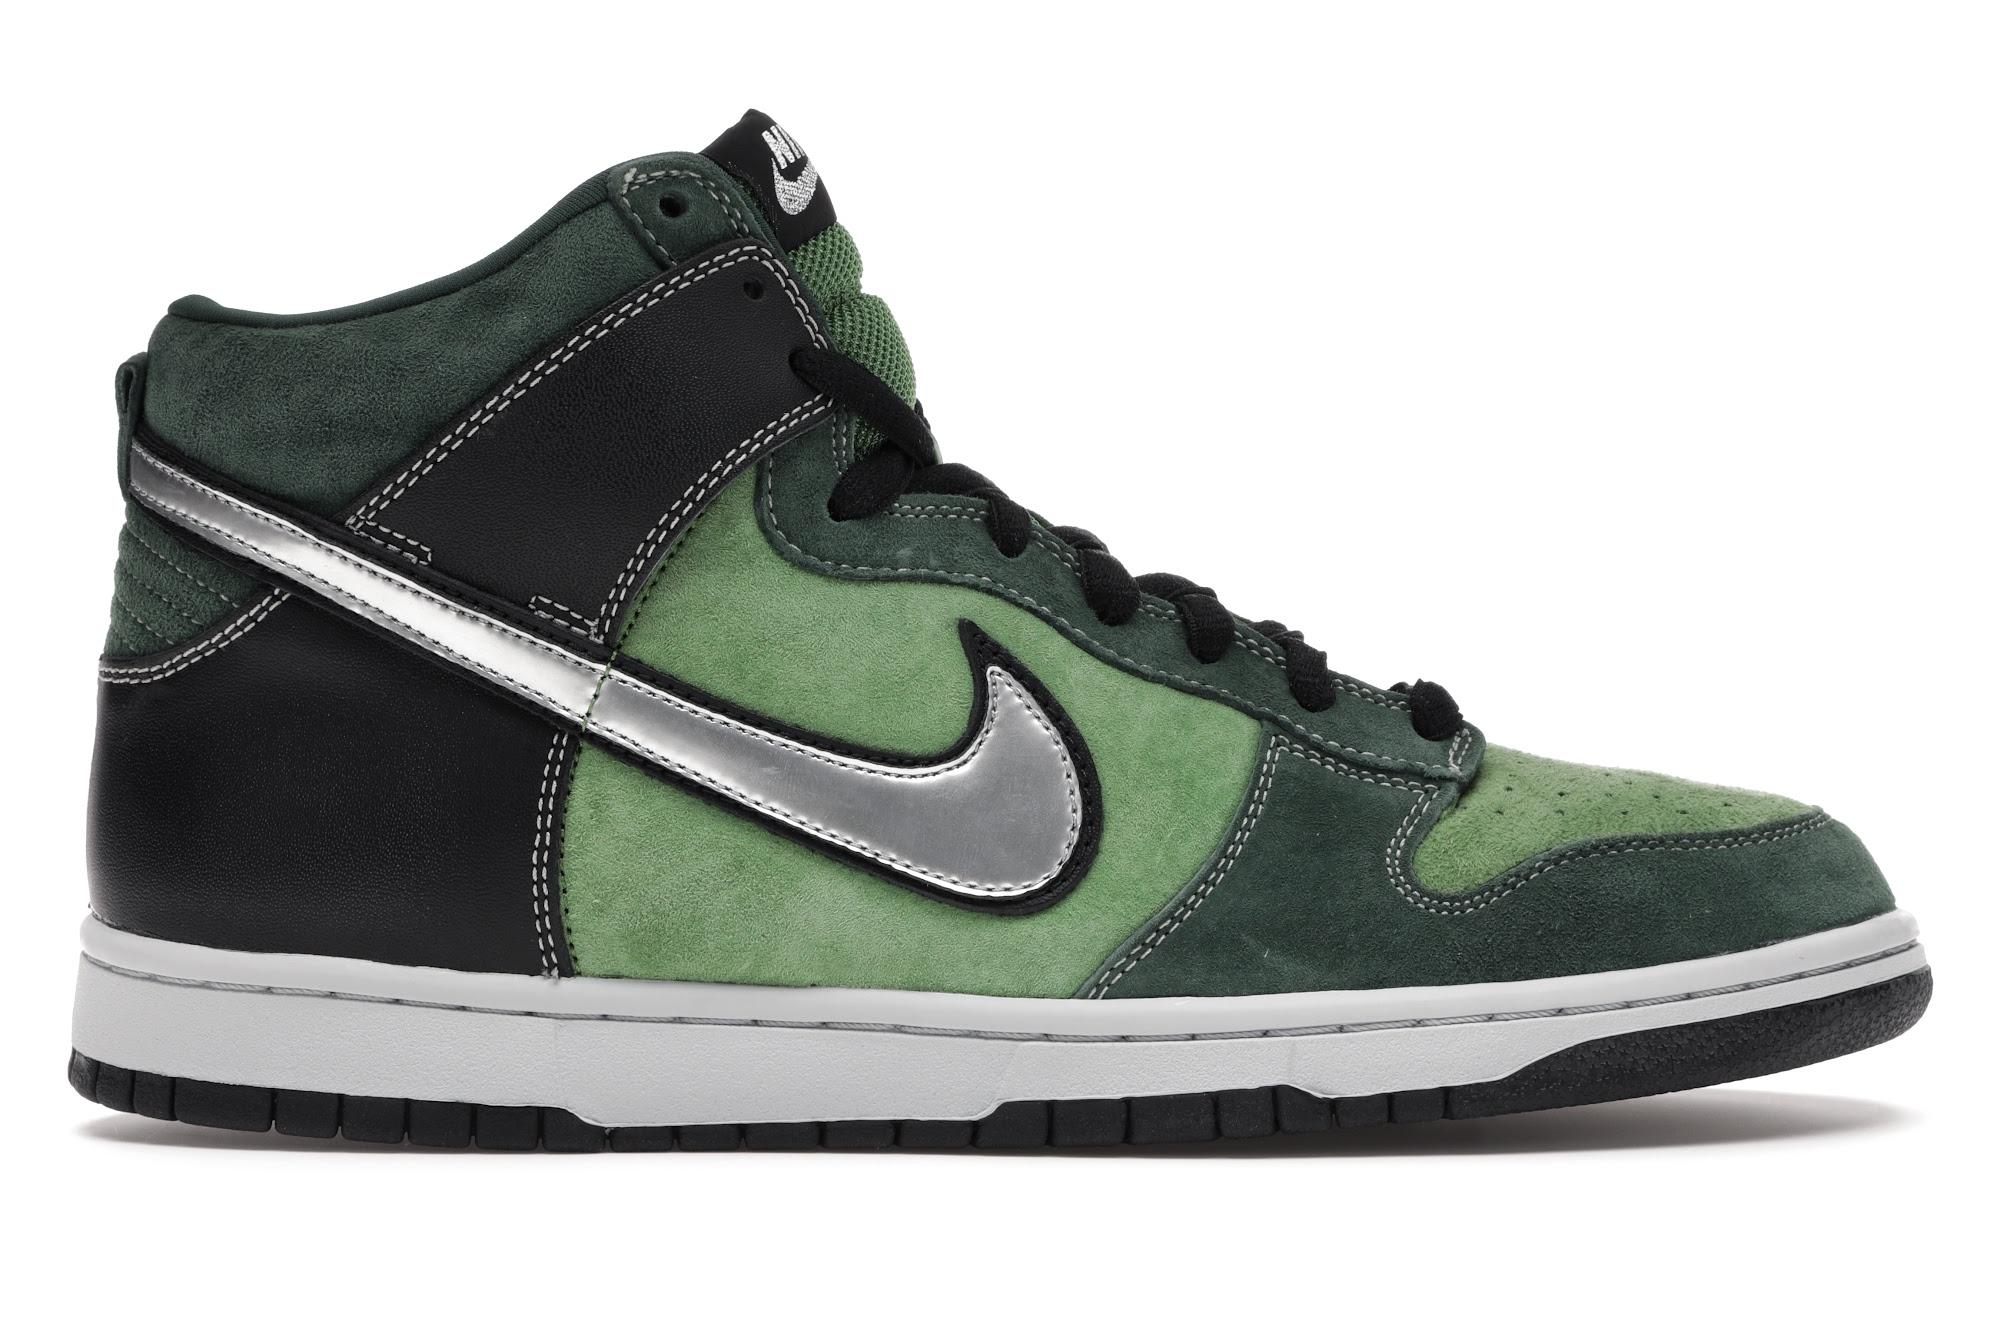 Nike Dunk SB High Brut - 305050-304